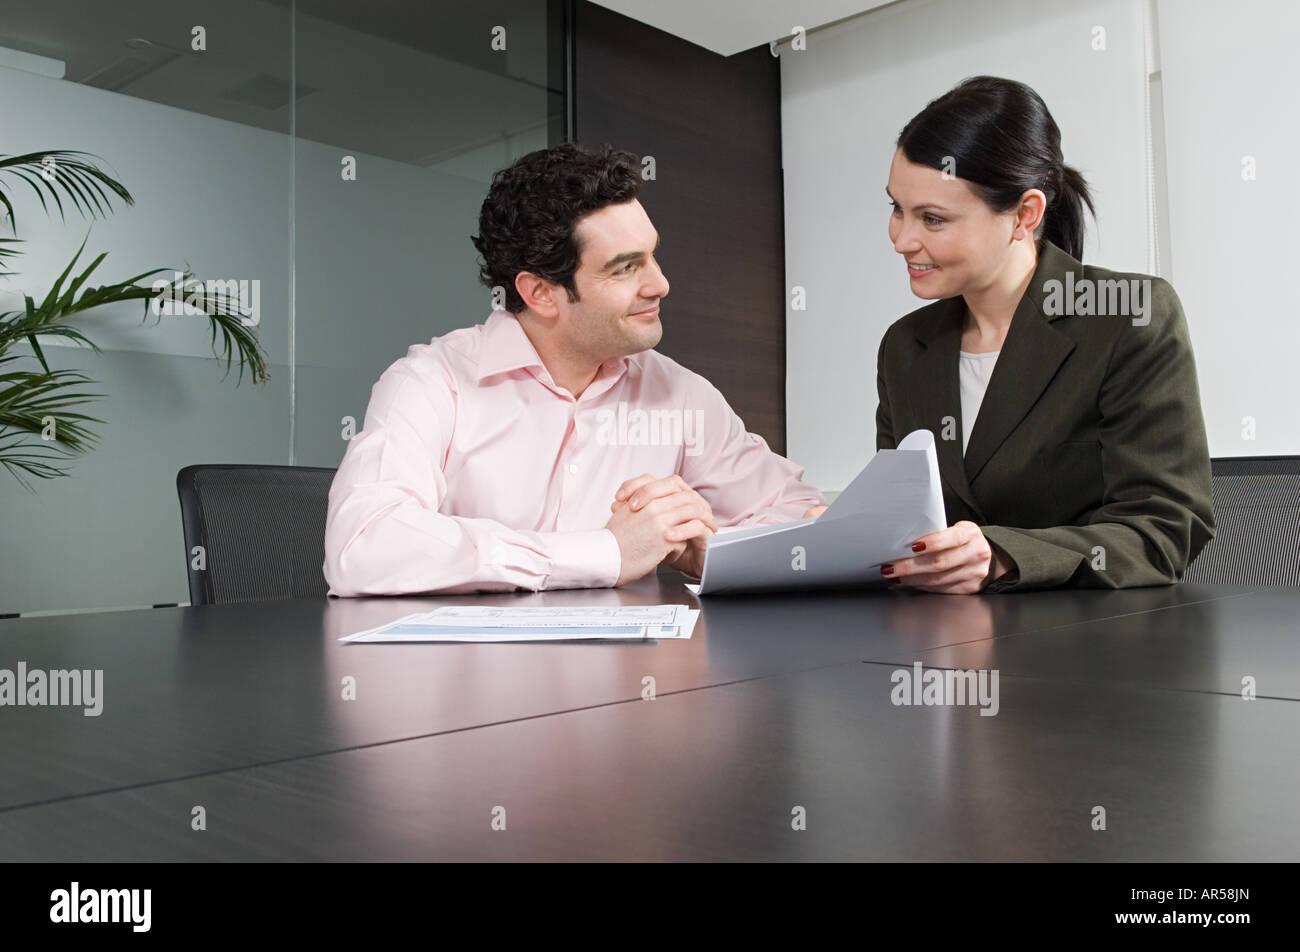 Bank manager helping customer - Stock Image